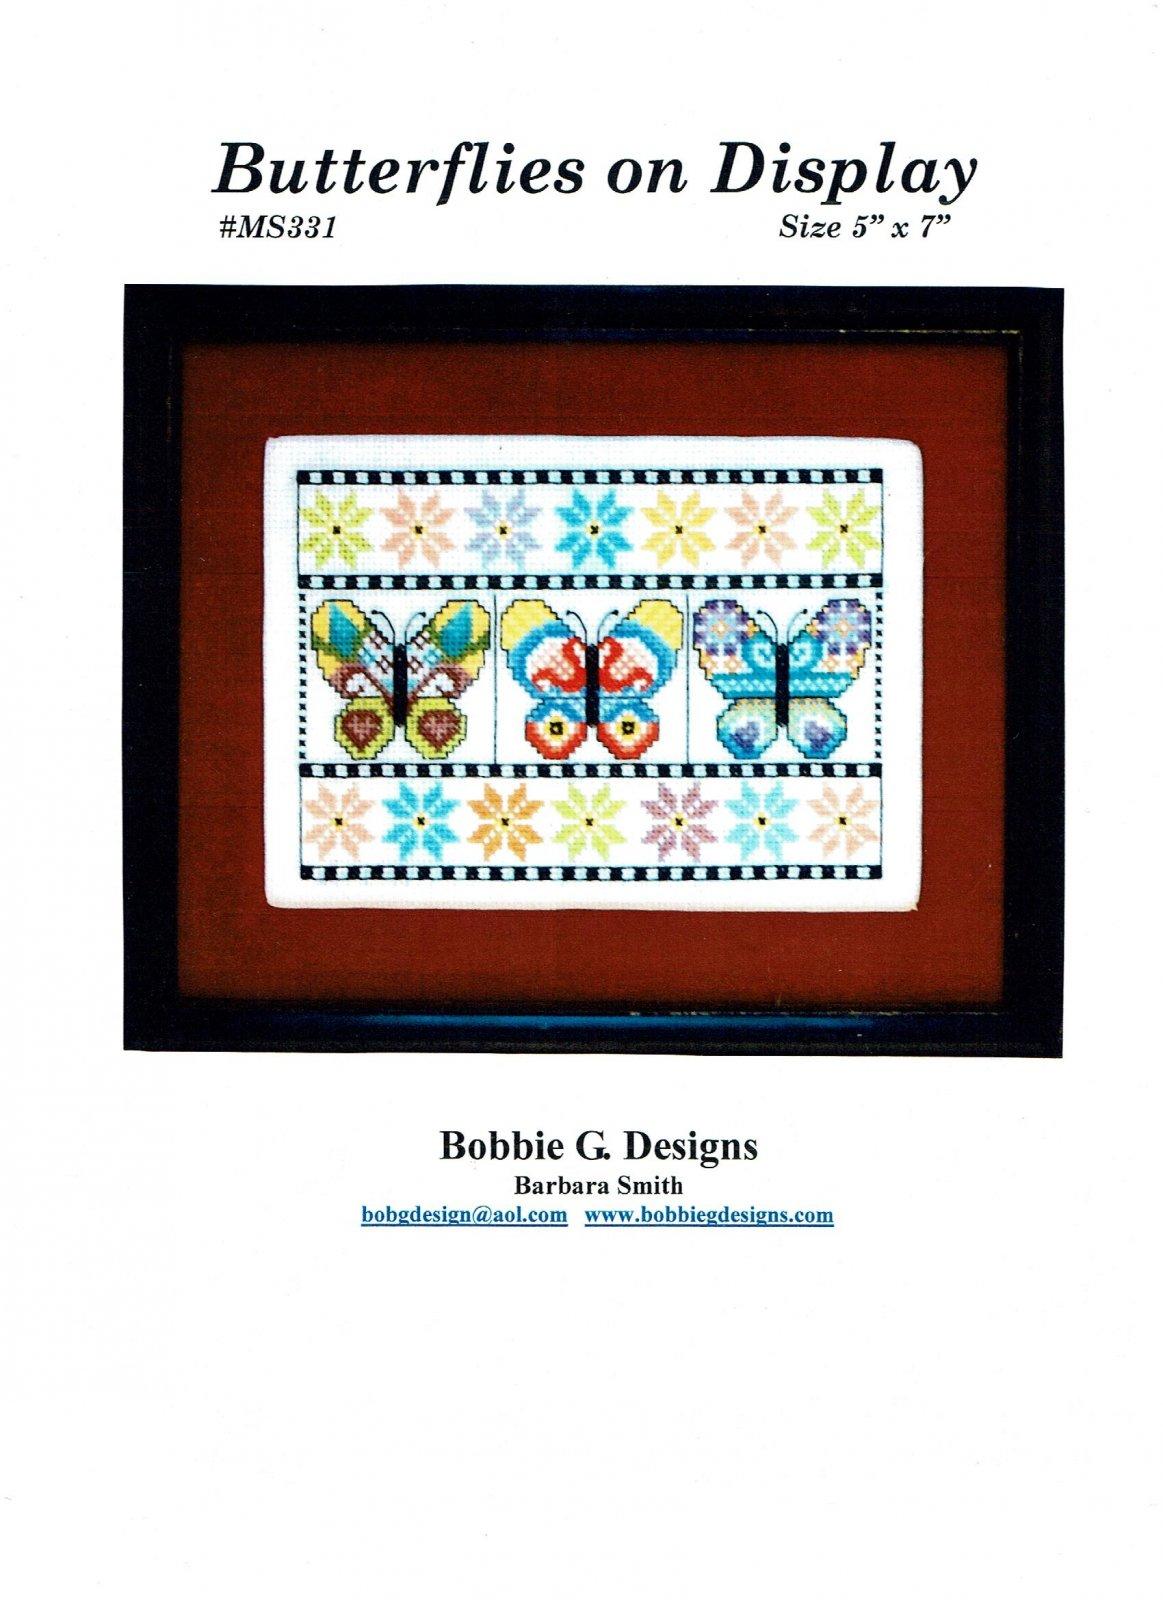 -6- 317 Butterflies on Display by Bobbie G